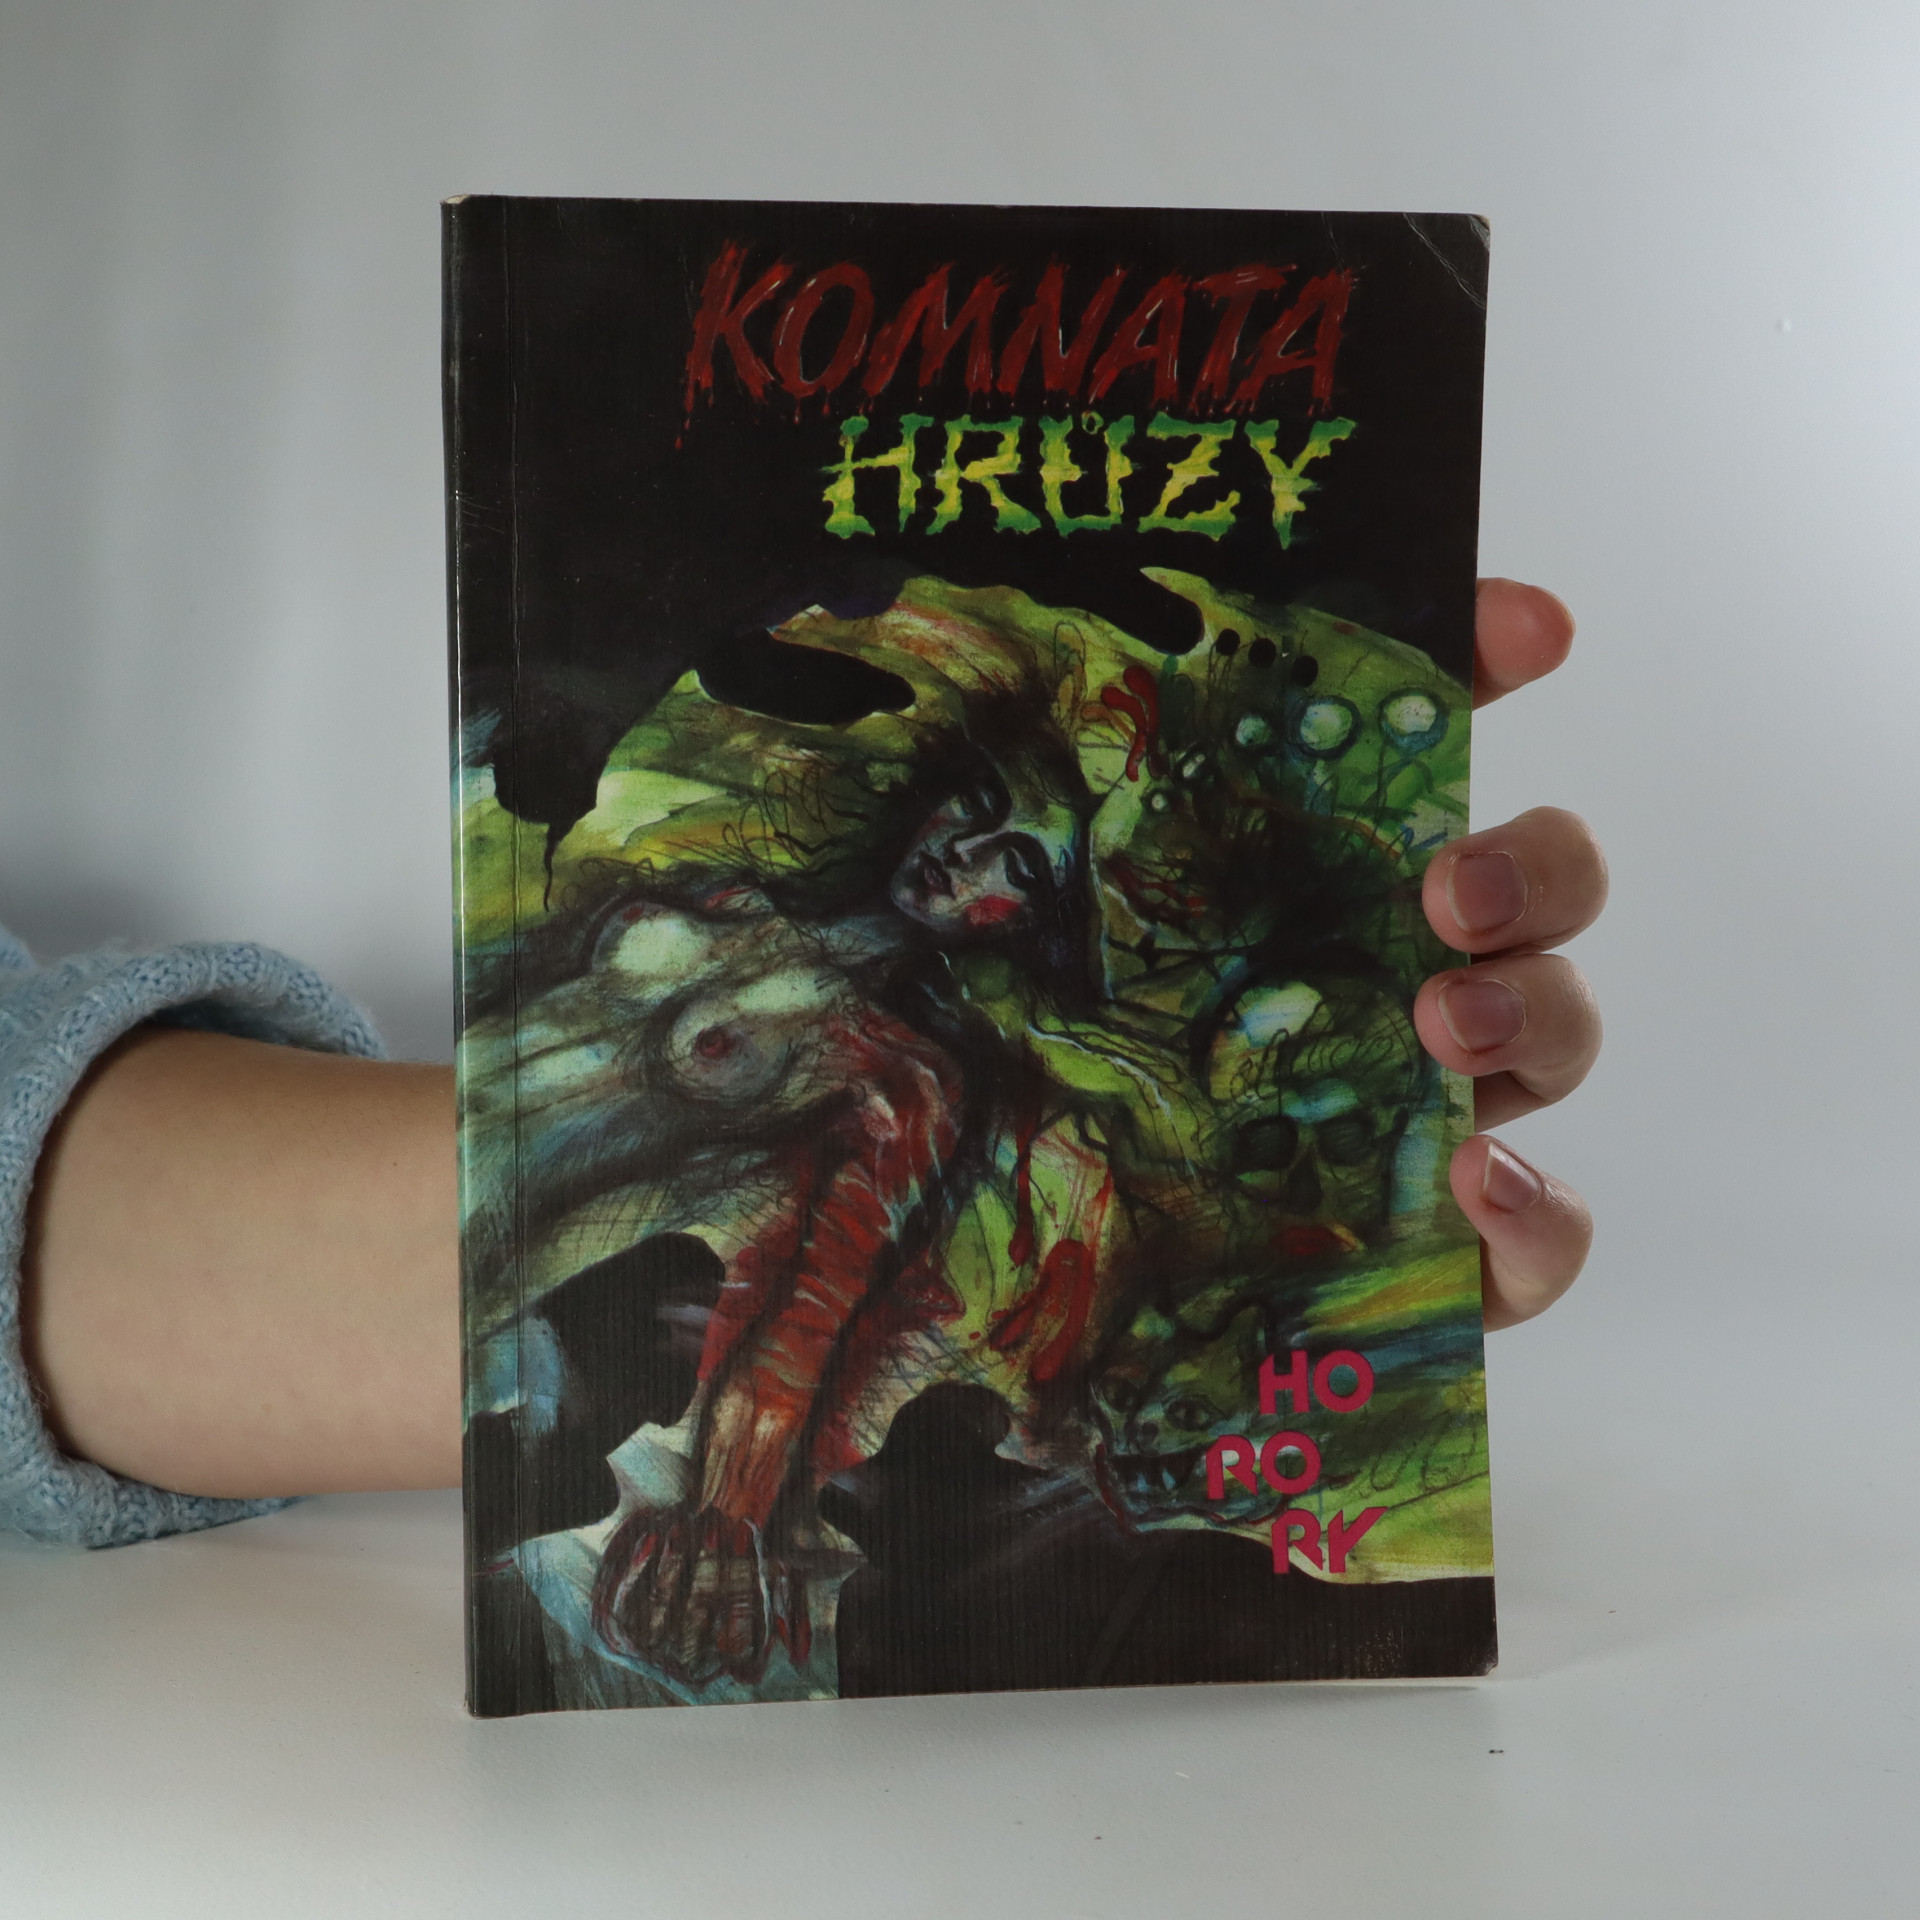 antikvární kniha Komnata hrůzy, 1991